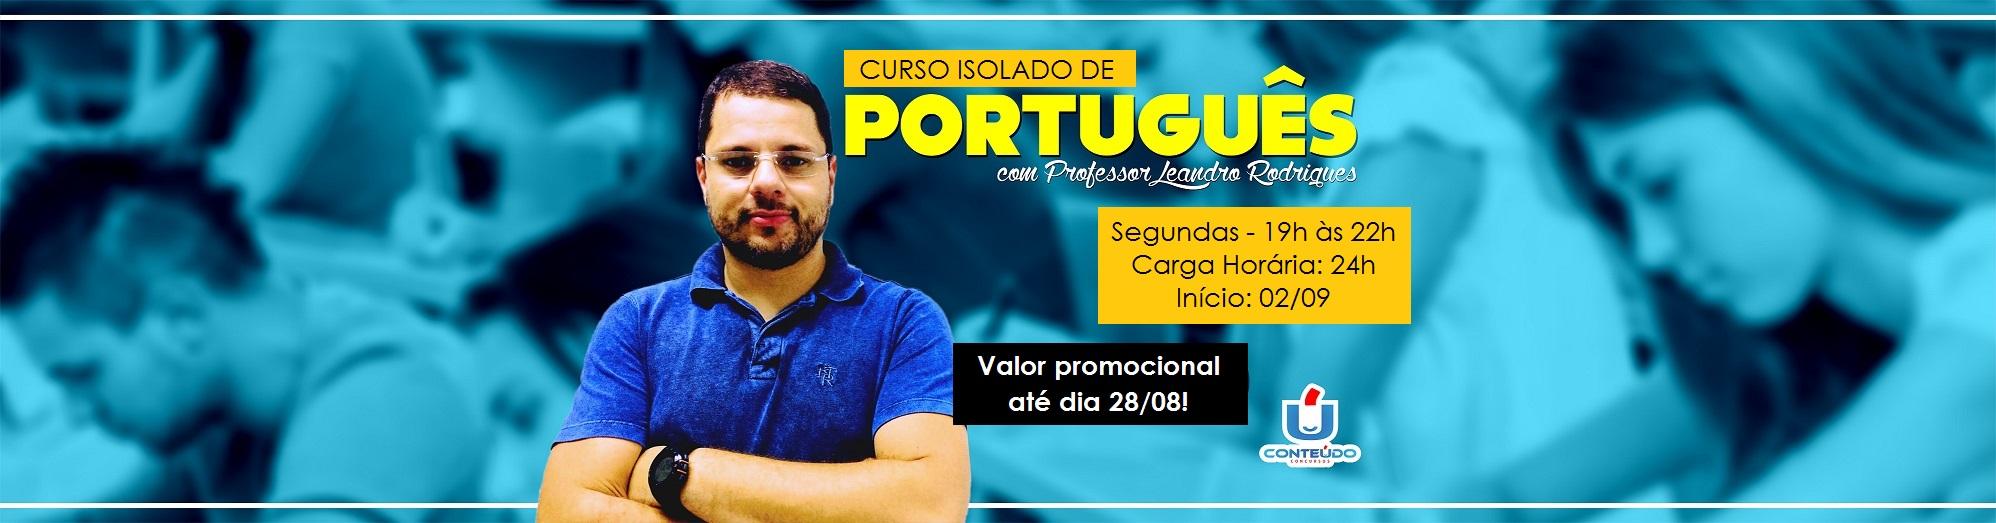 isolado de portugues